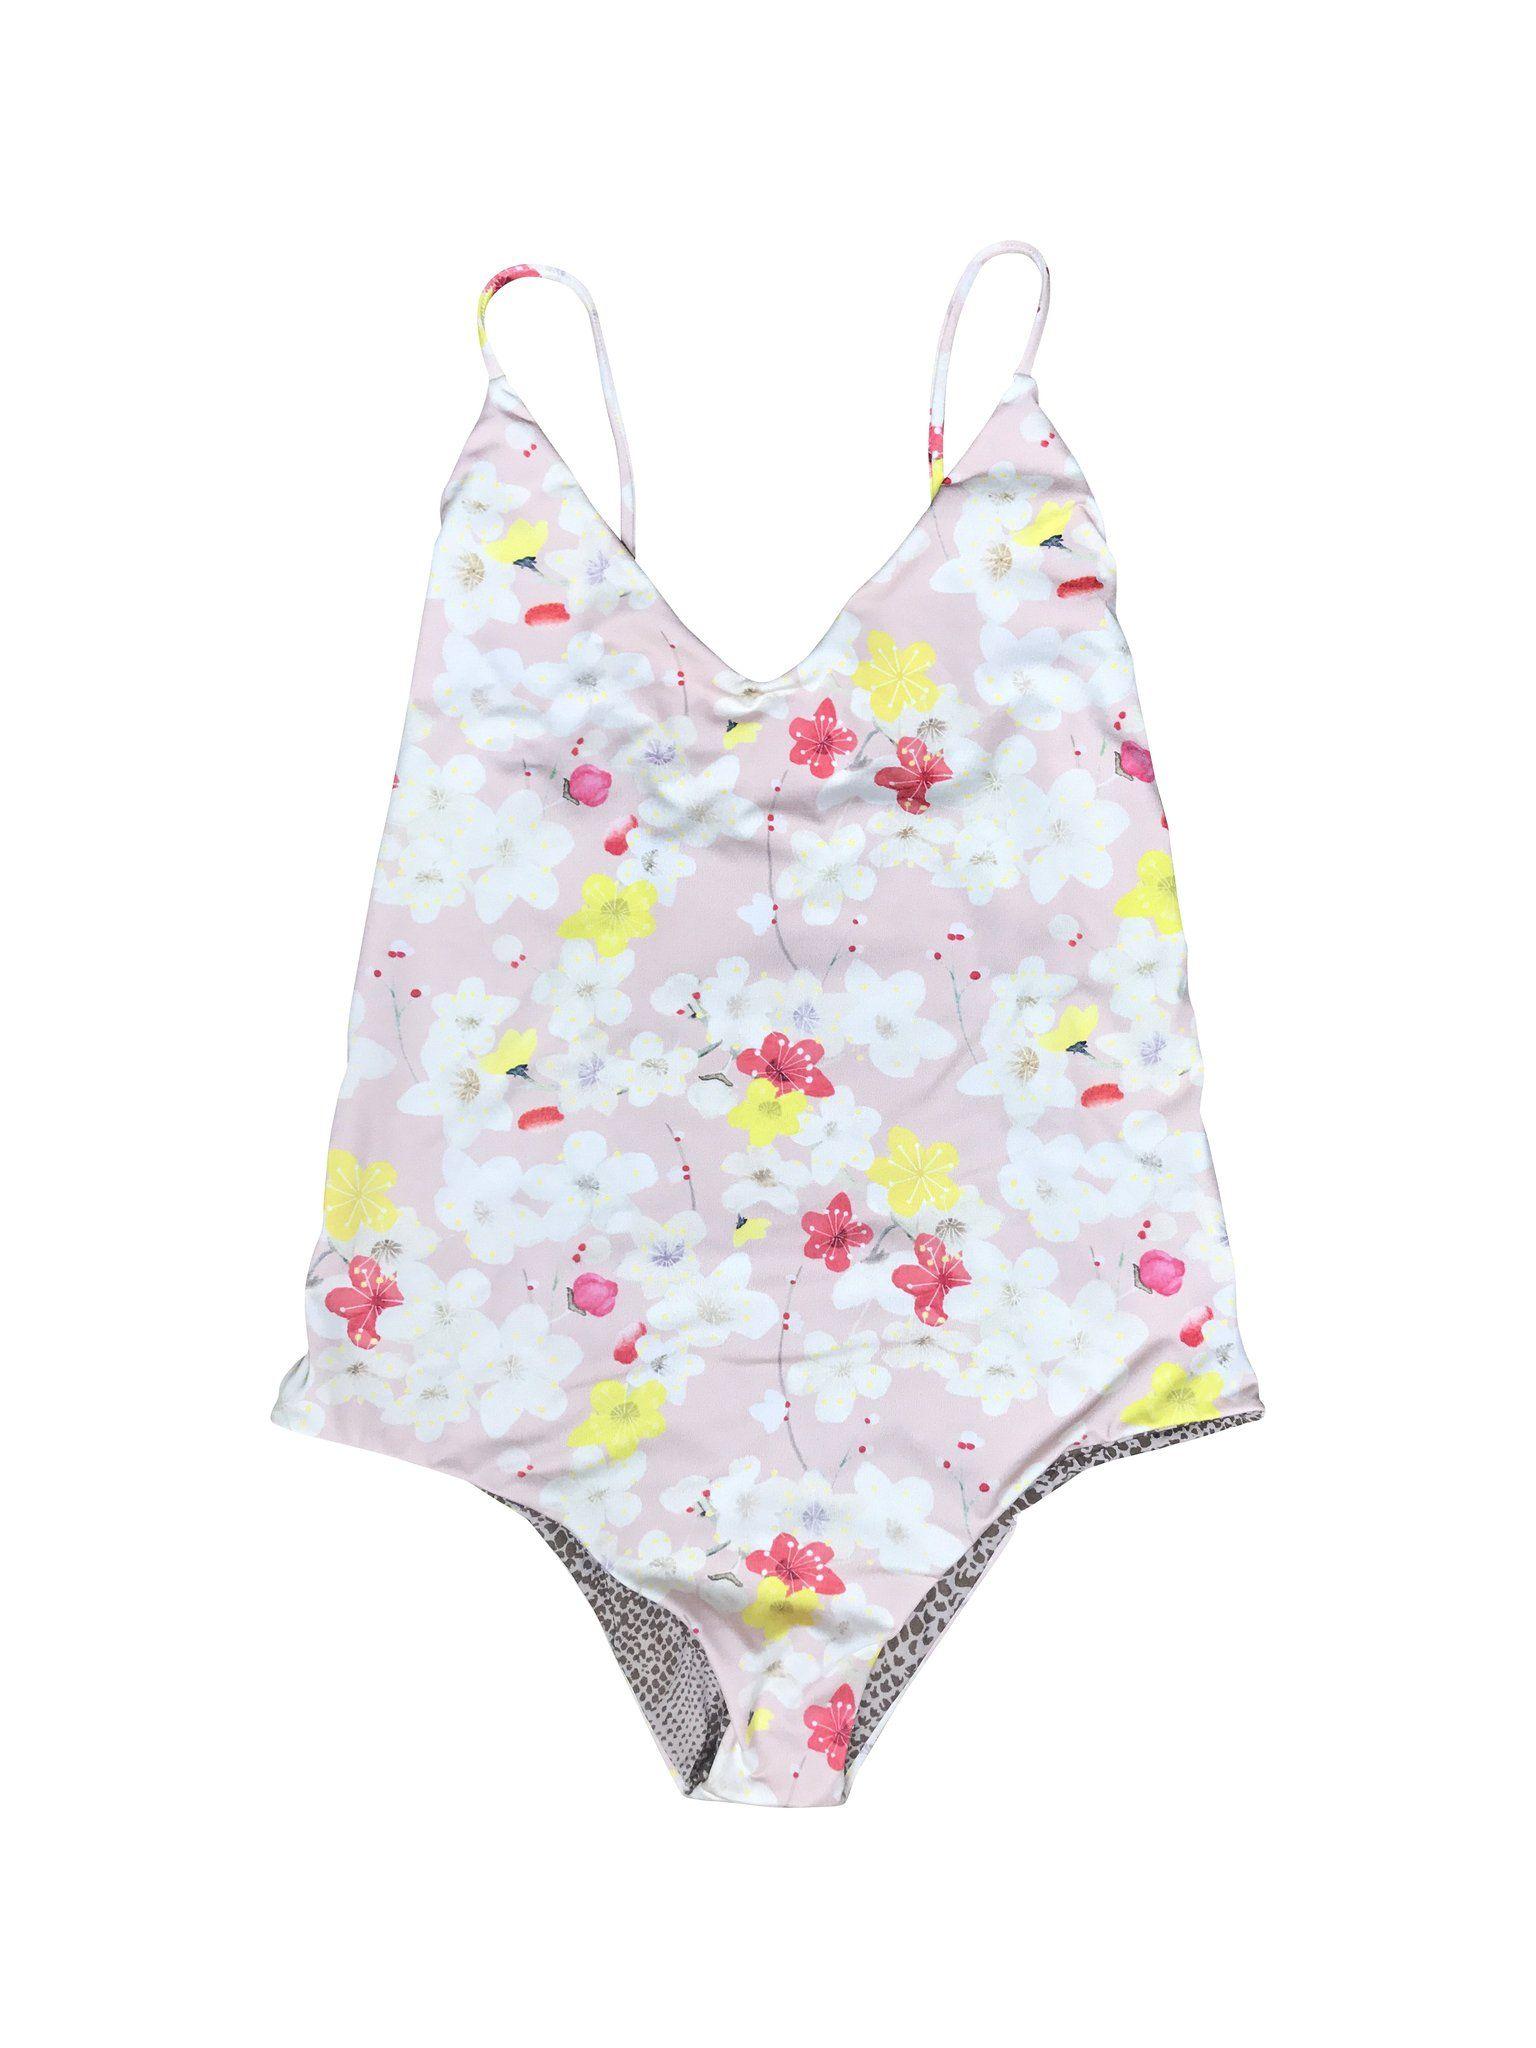 f7f33b3181 ACACIA Banyans Full Piece   Cherry Acacia Swimwear, Beach Gear, Resort  Wear, Cherry